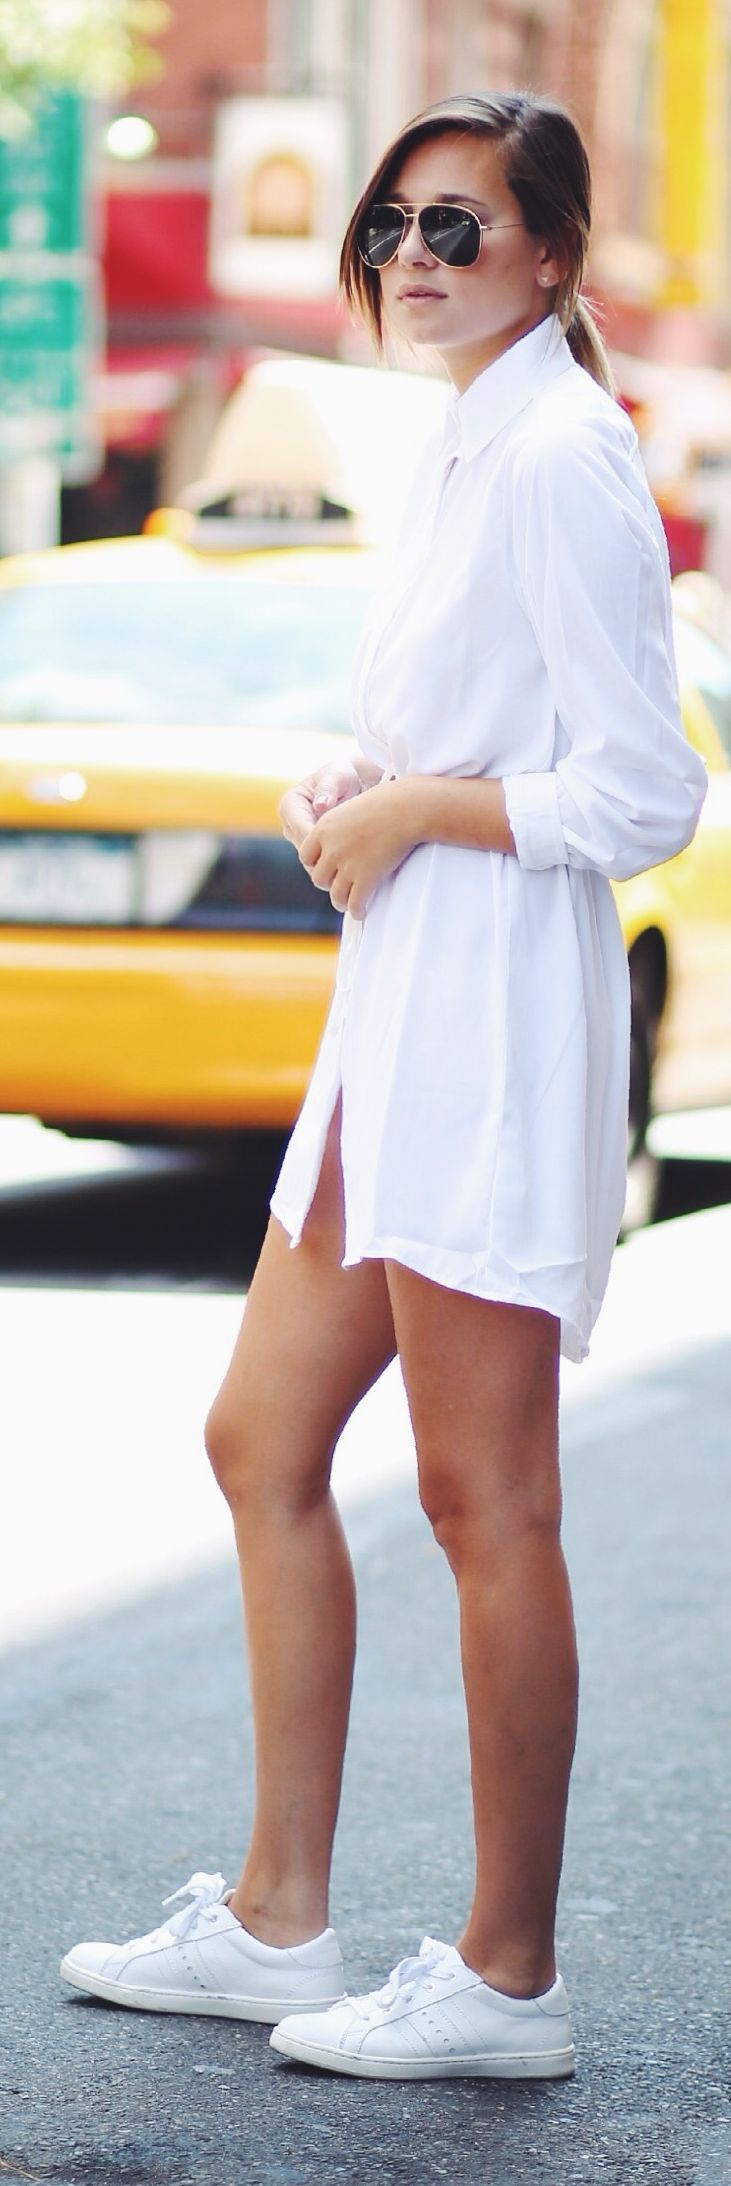 Asos White Mini Shirt Dress by We Wore What